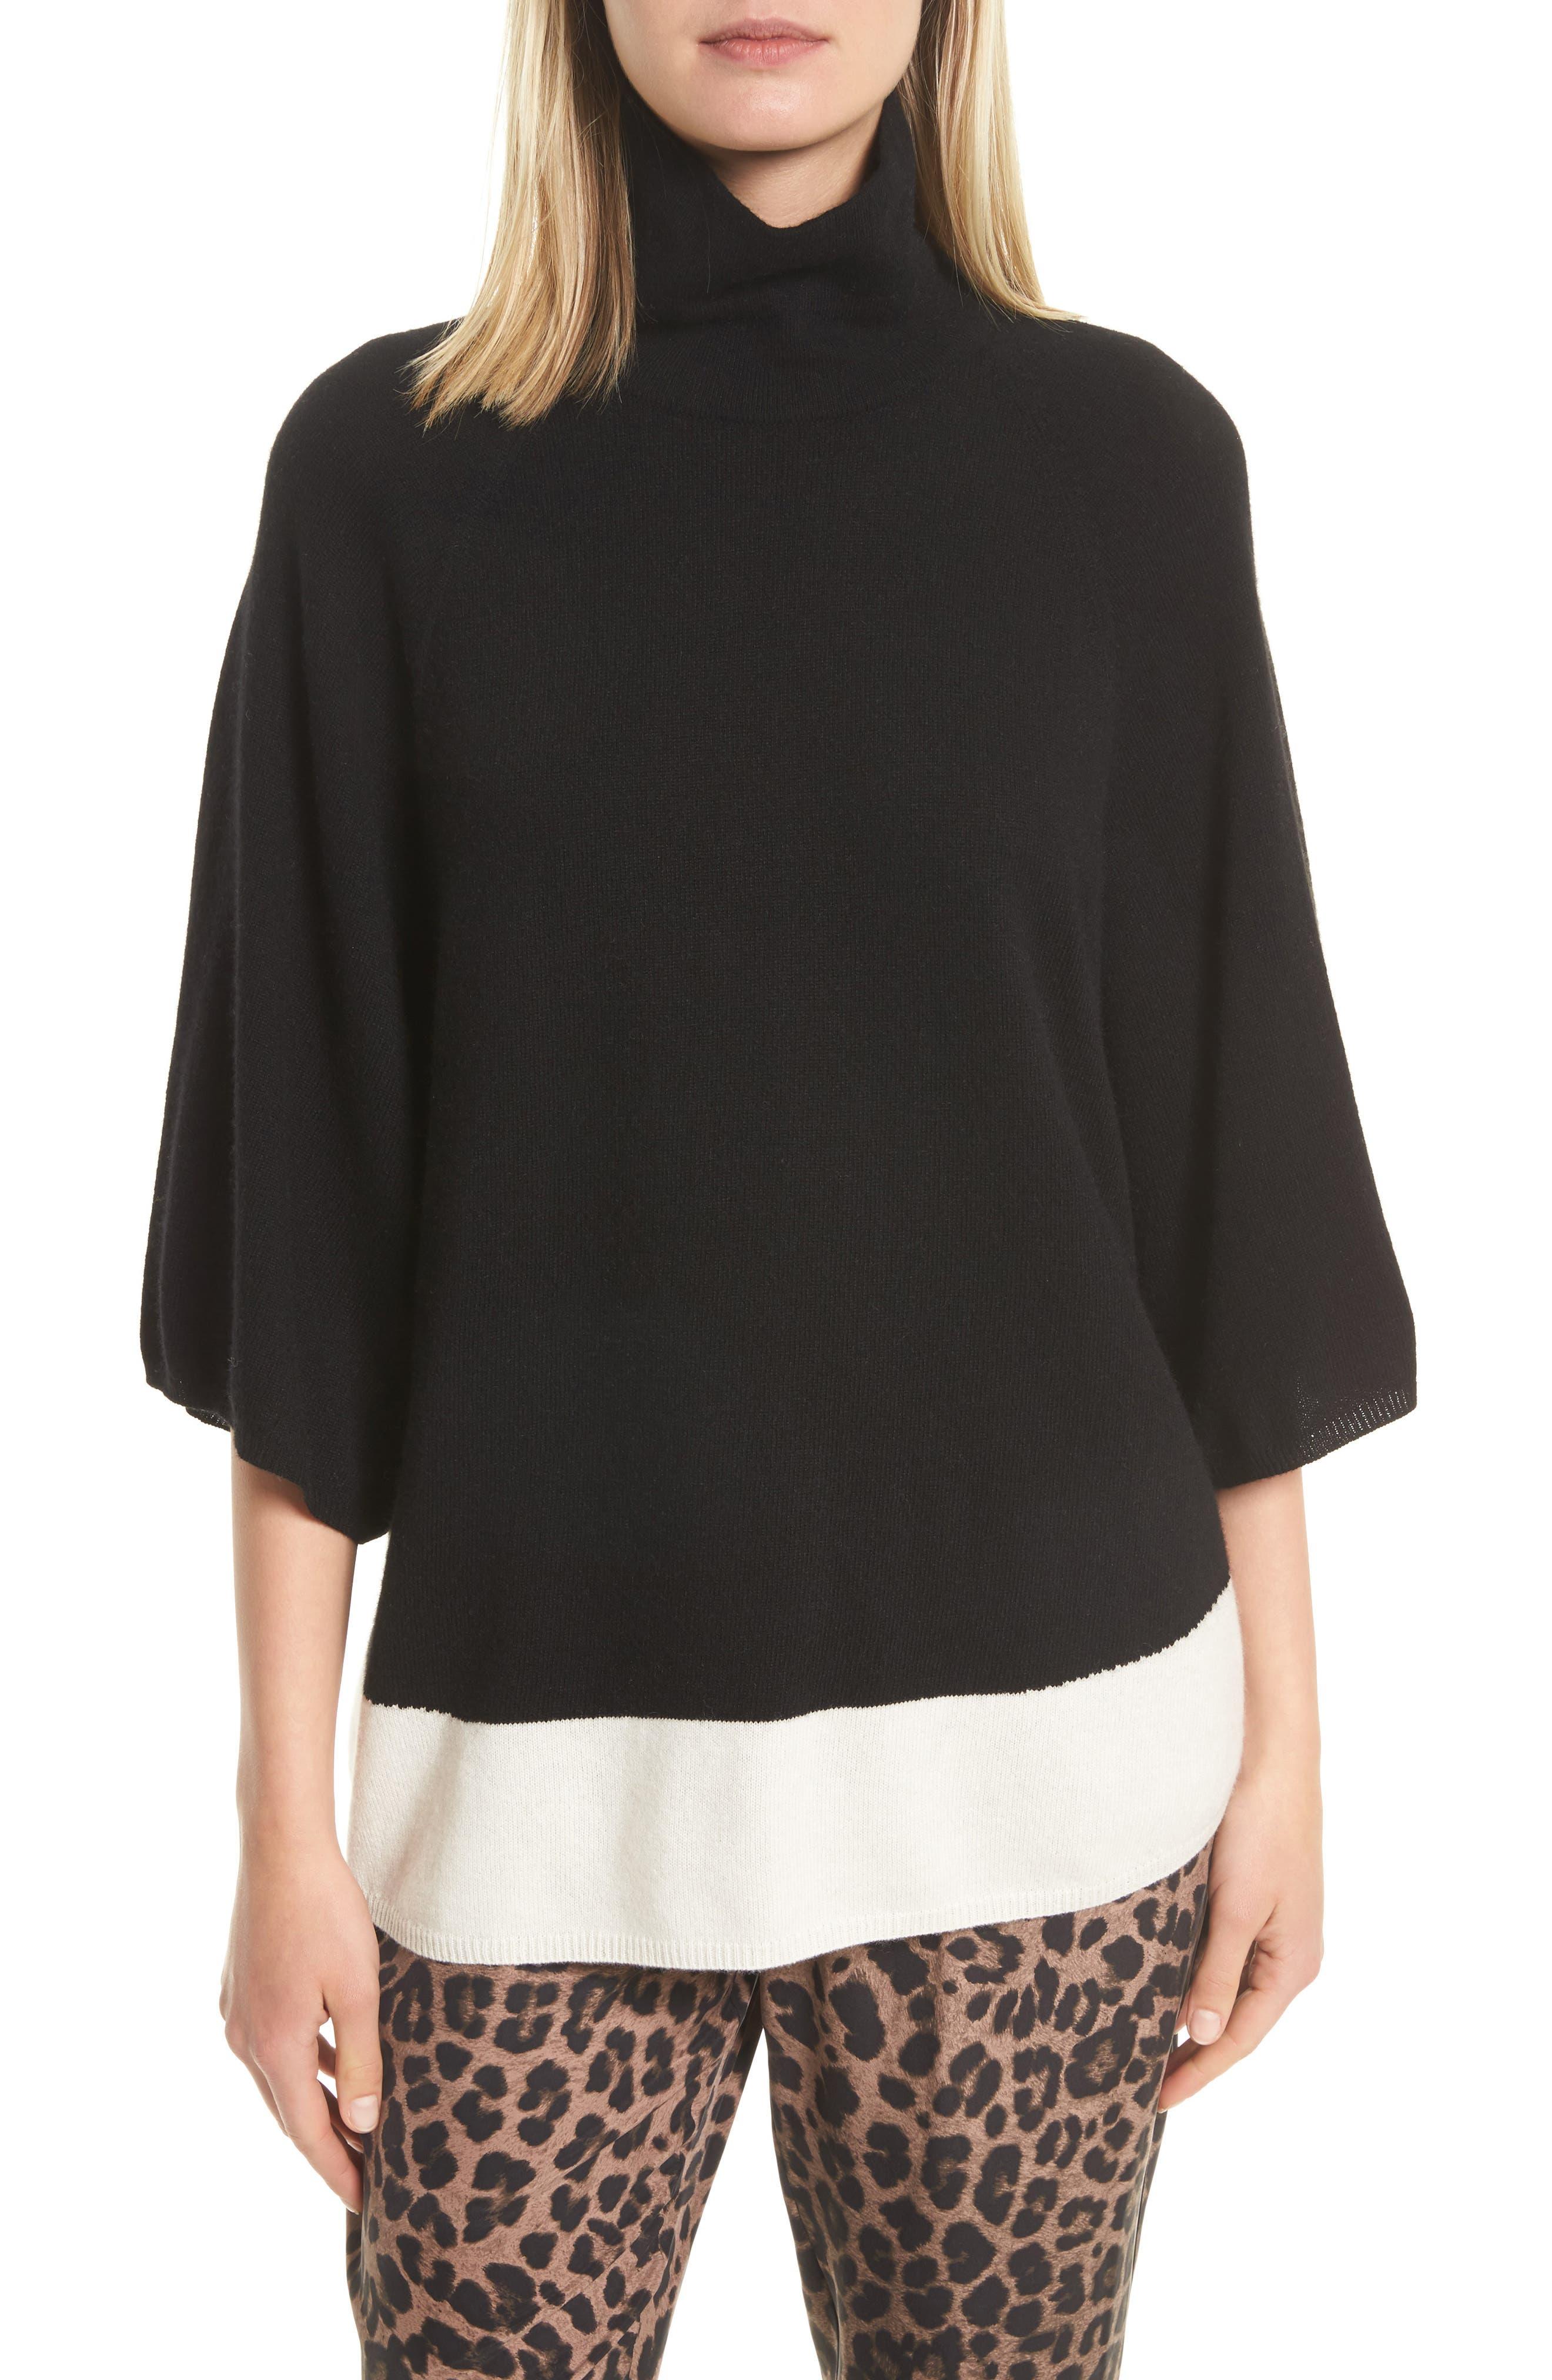 Celia G Wool & Cashmere Sweater,                         Main,                         color, 004